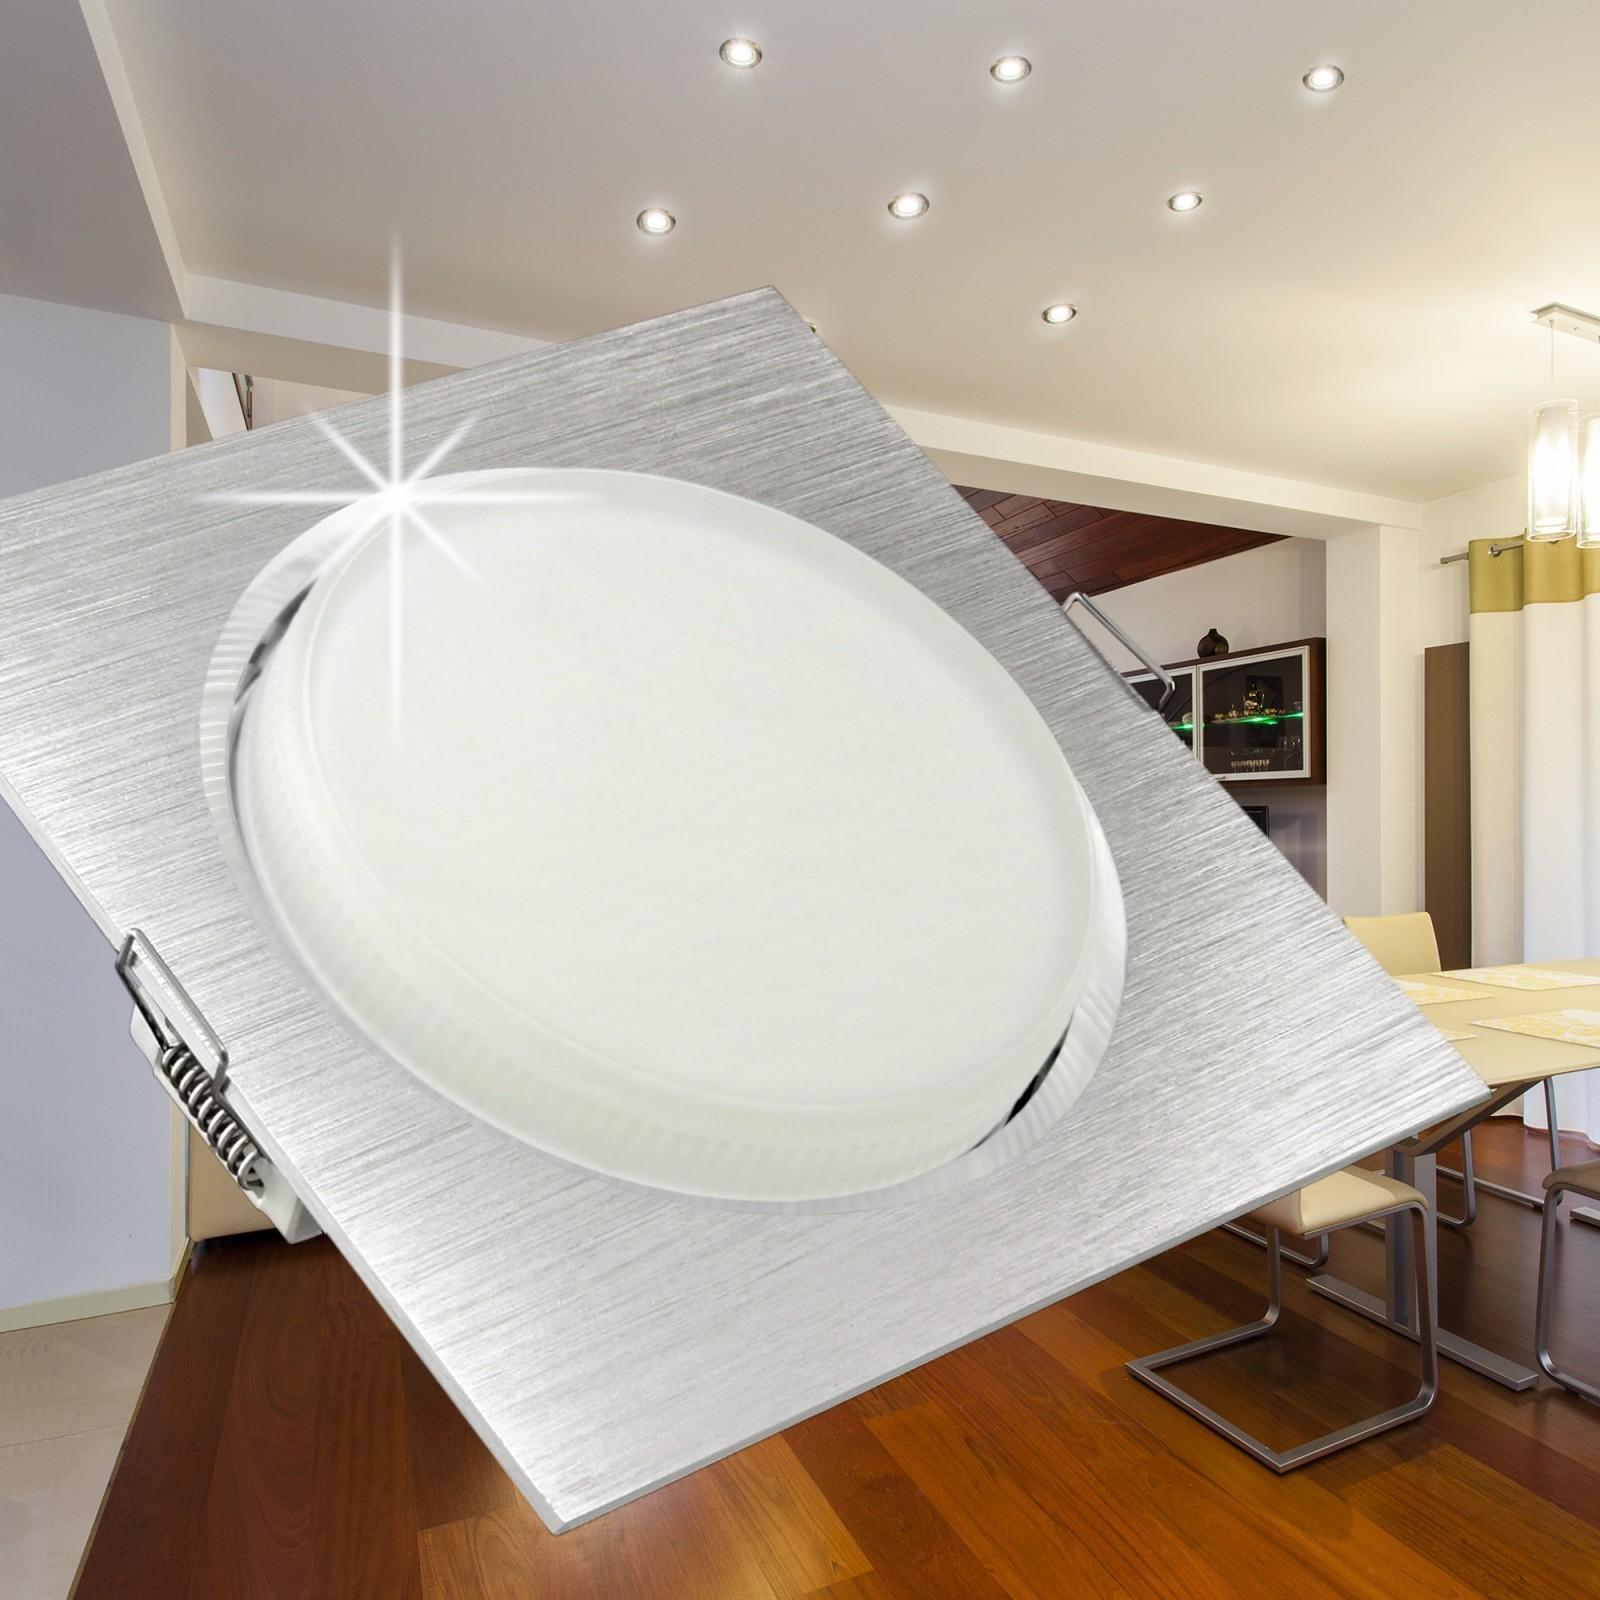 rx 3 rx 4 flache led einbauleuchten einbaustrahler spots. Black Bedroom Furniture Sets. Home Design Ideas